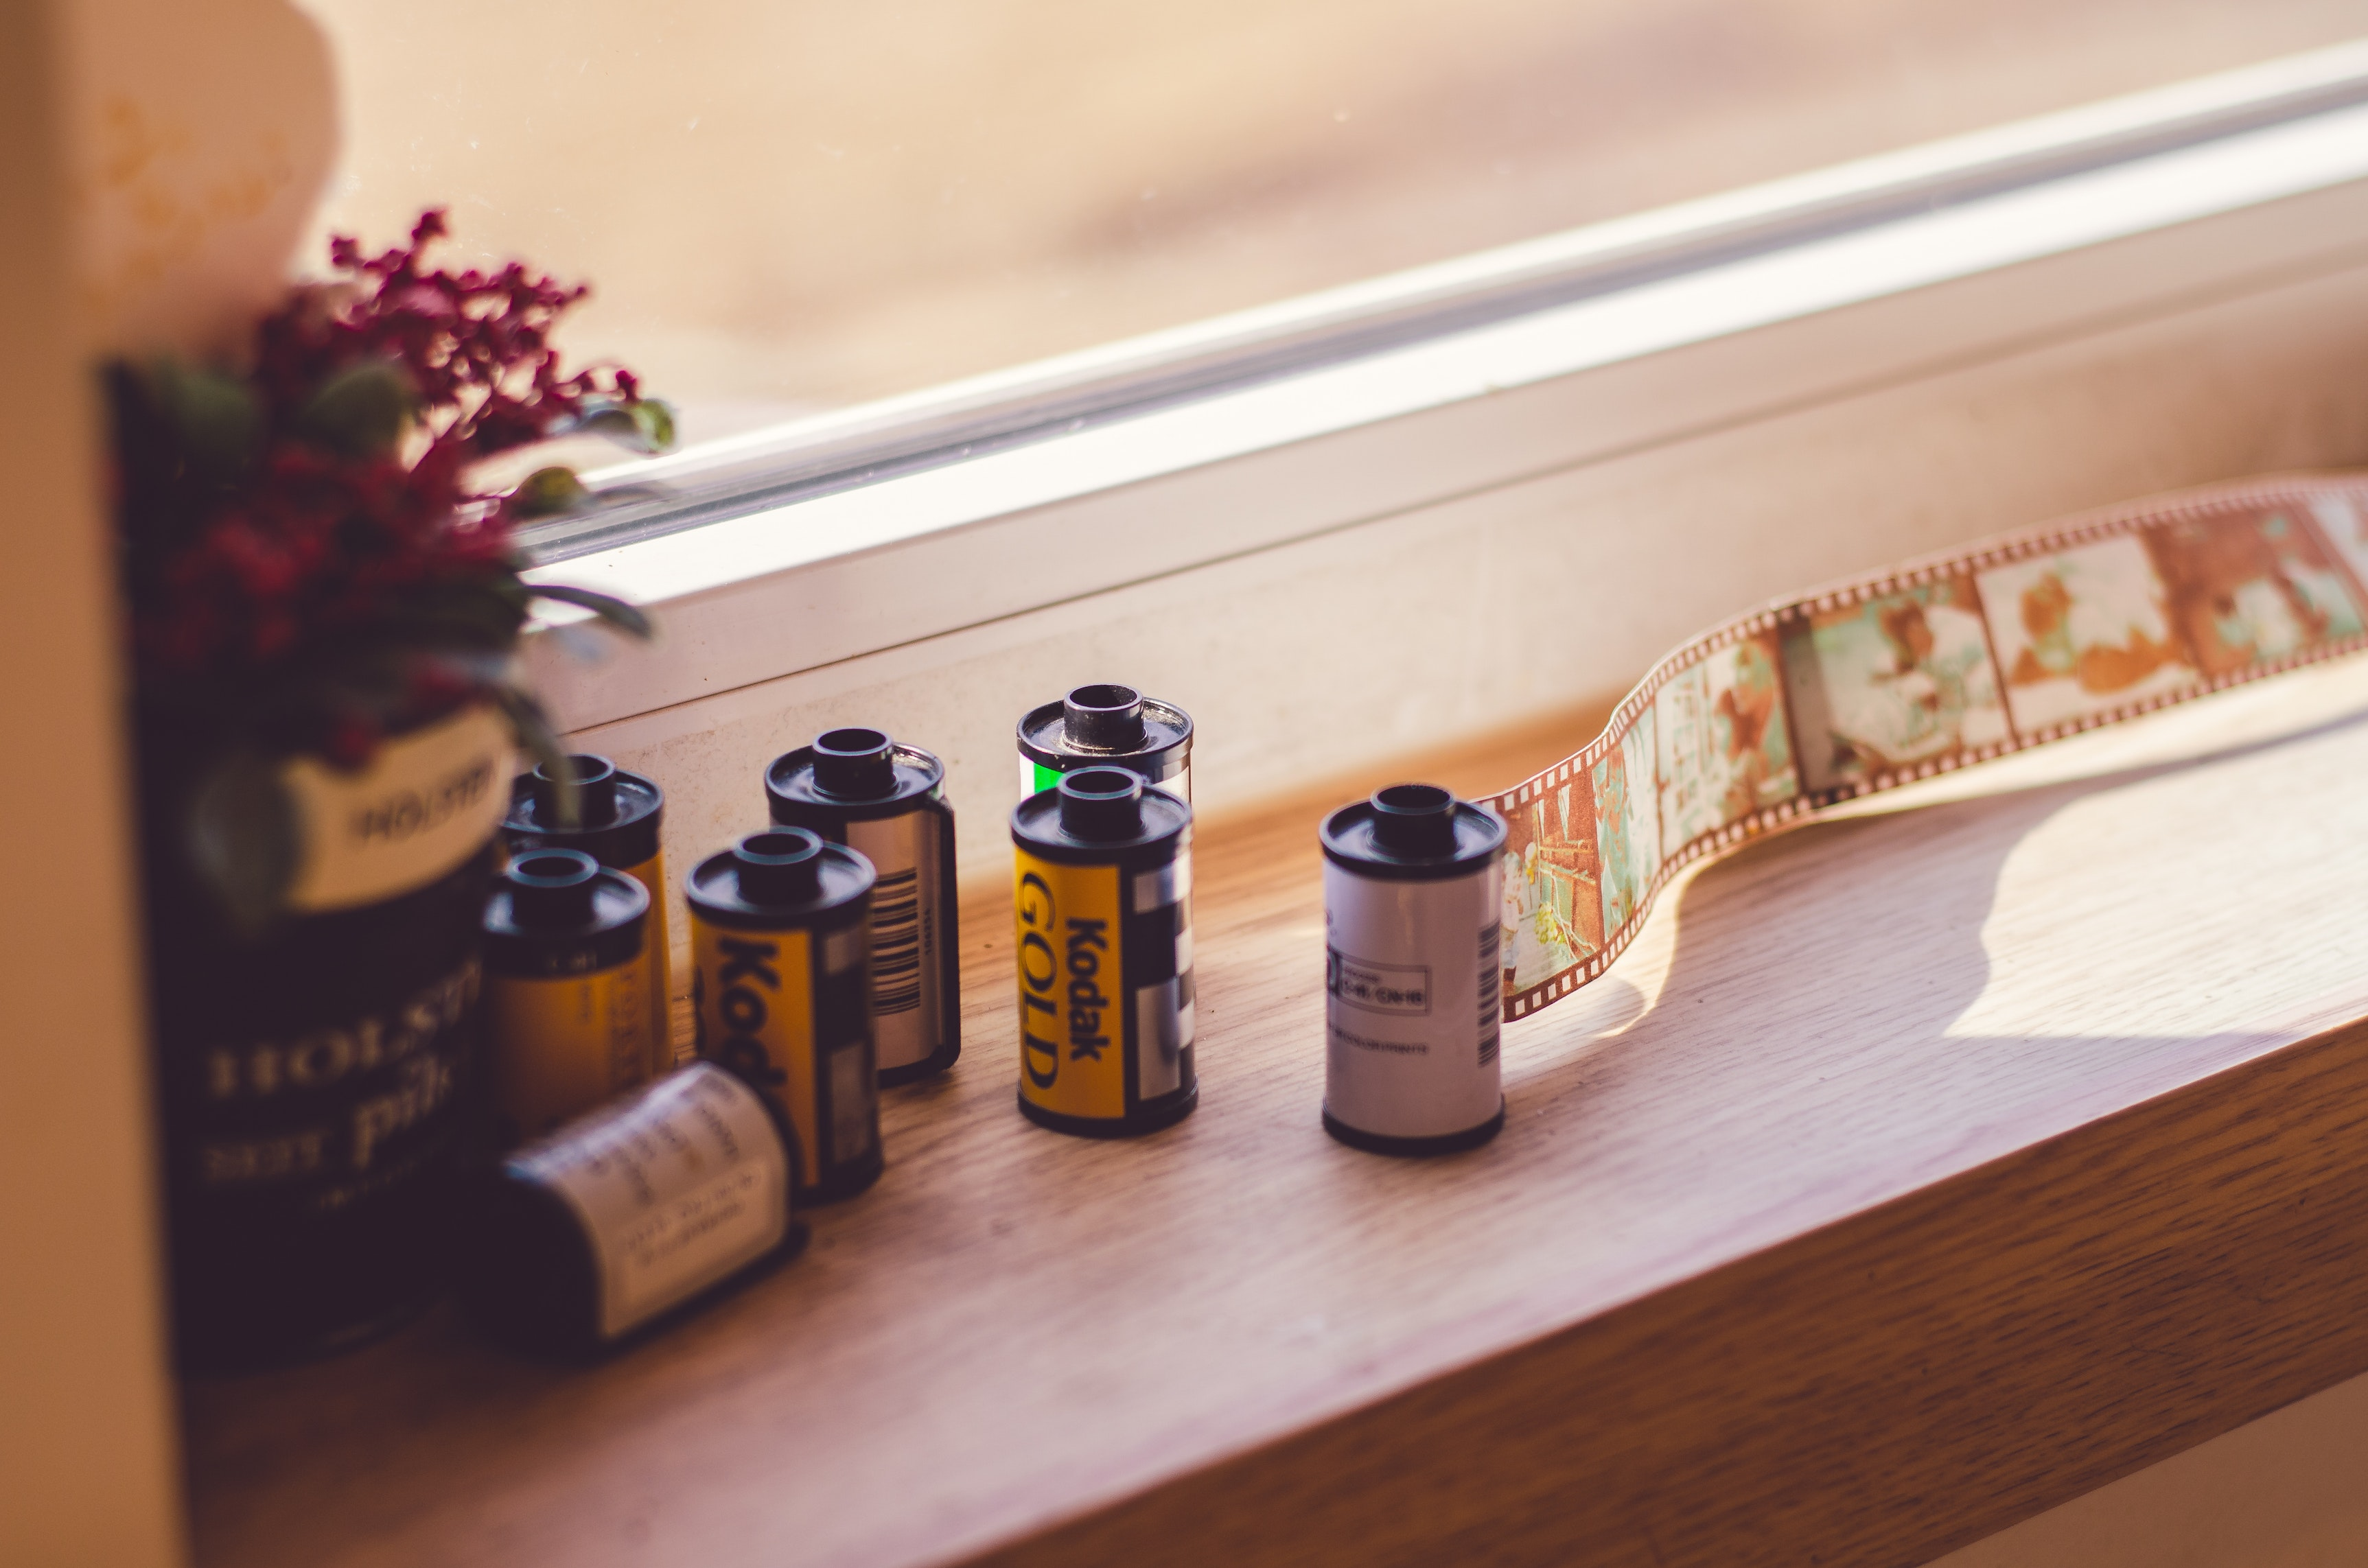 Films on windowsill (Pic: Estherkoon/Pexels)